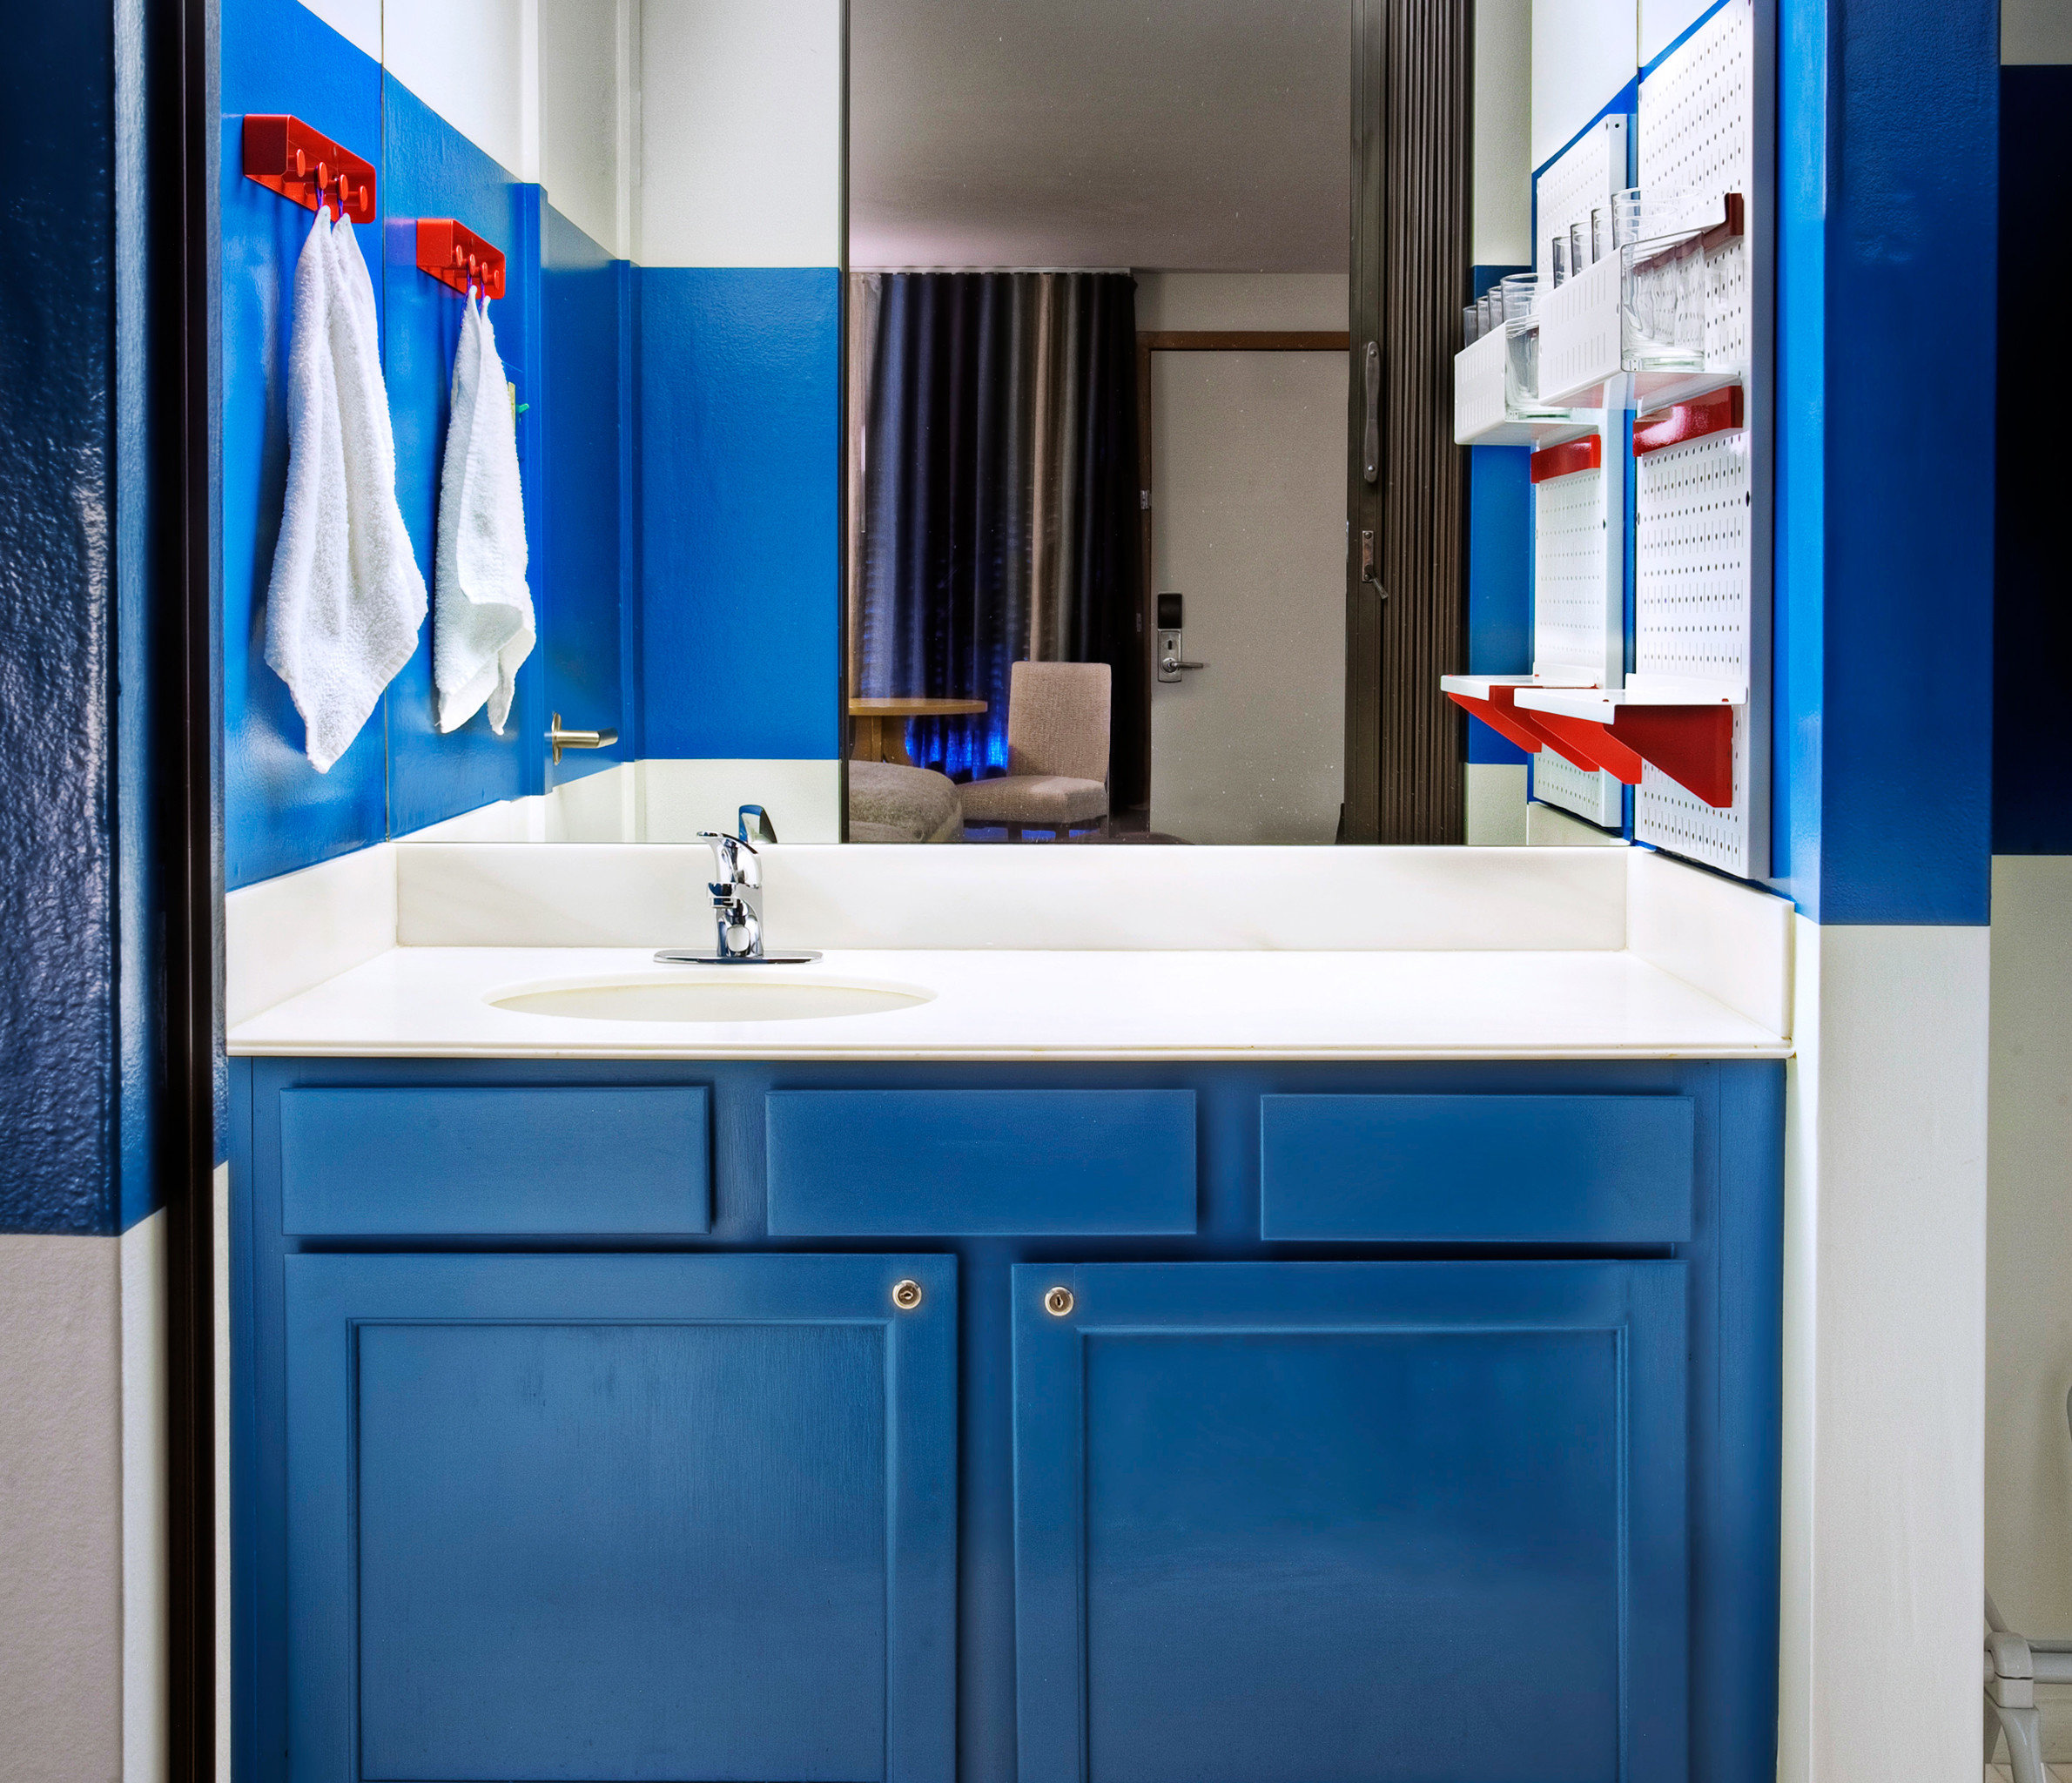 Bath Lodge Mountains Ski cabinet blue bathroom white door home plumbing fixture sink kitchen appliance colored